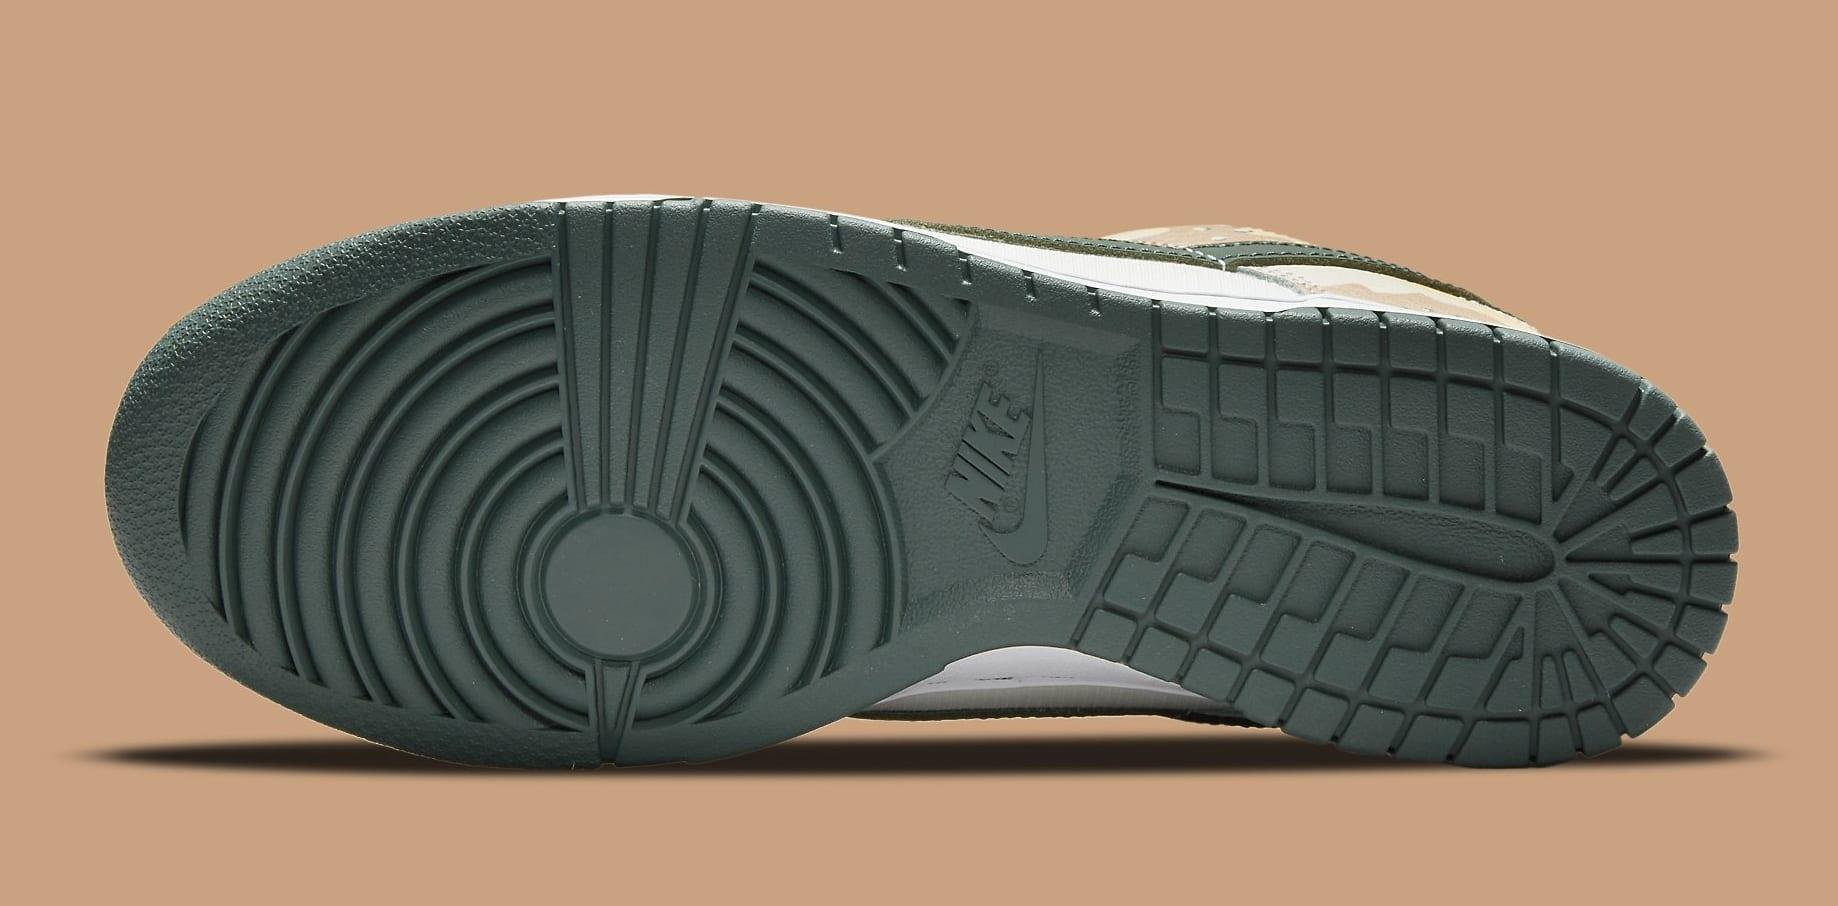 Nike Dunk Low 'Sail Multi-Camo' DH0957-100 Outsole